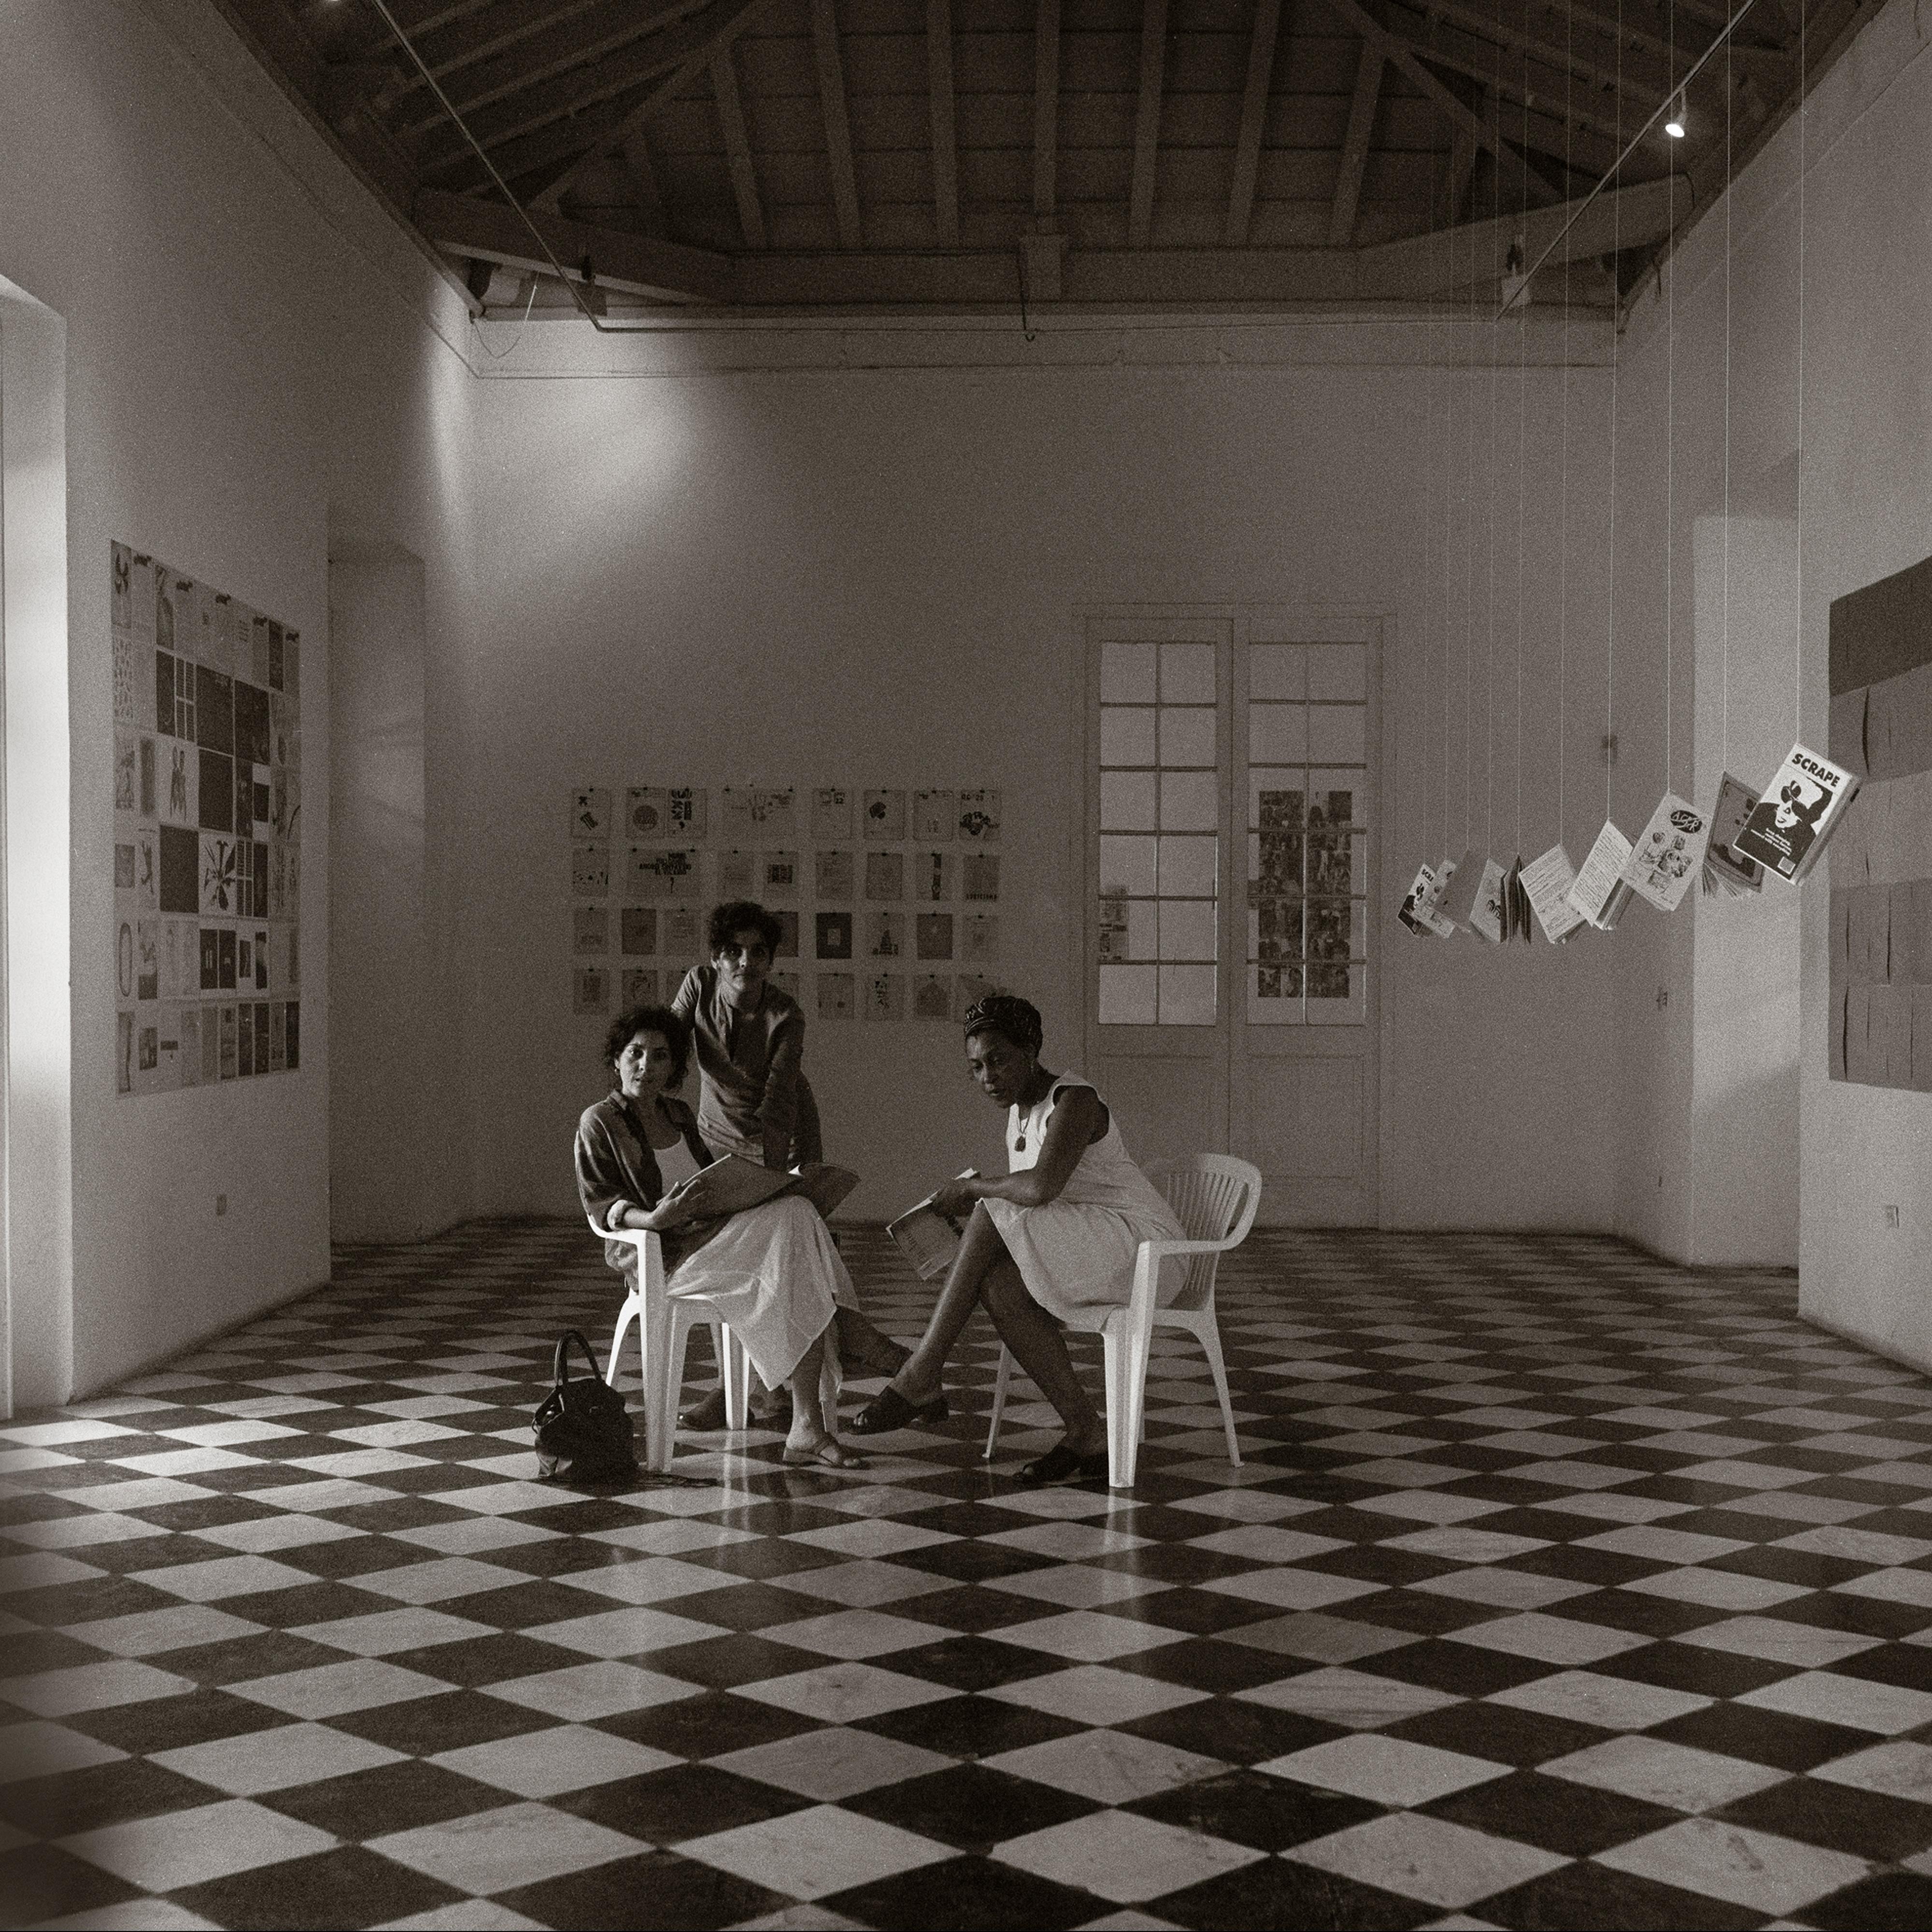 Galerie Barbara Thumm \ Carrie Mae Weems: Three gallery sitters (CMW-02-013) \ Three gallery sitters (2002)